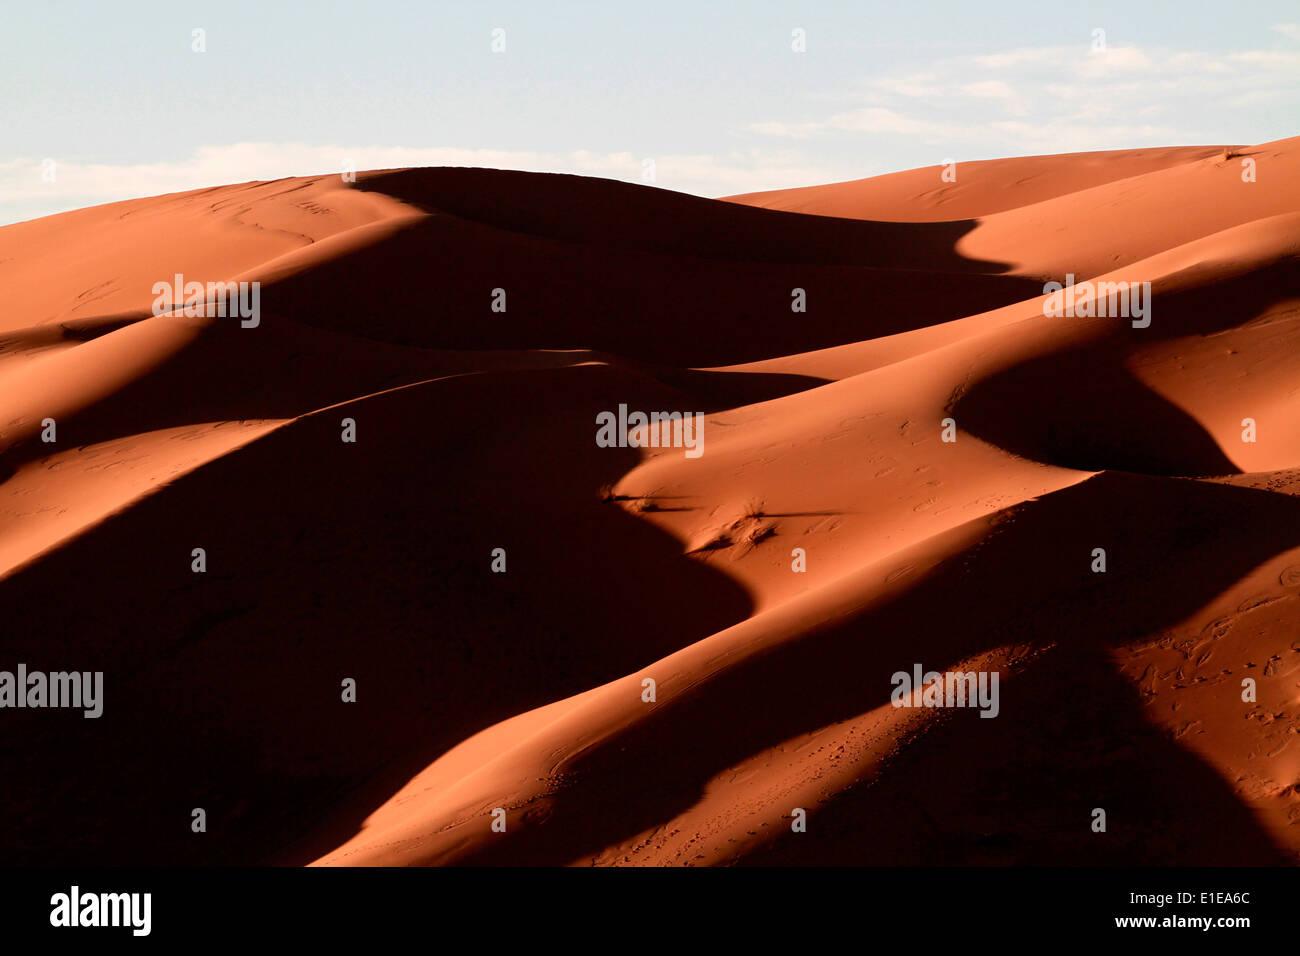 Erg Chebbi sand dunes in the Sahara desert near Merzouga, Morocco - Stock Image